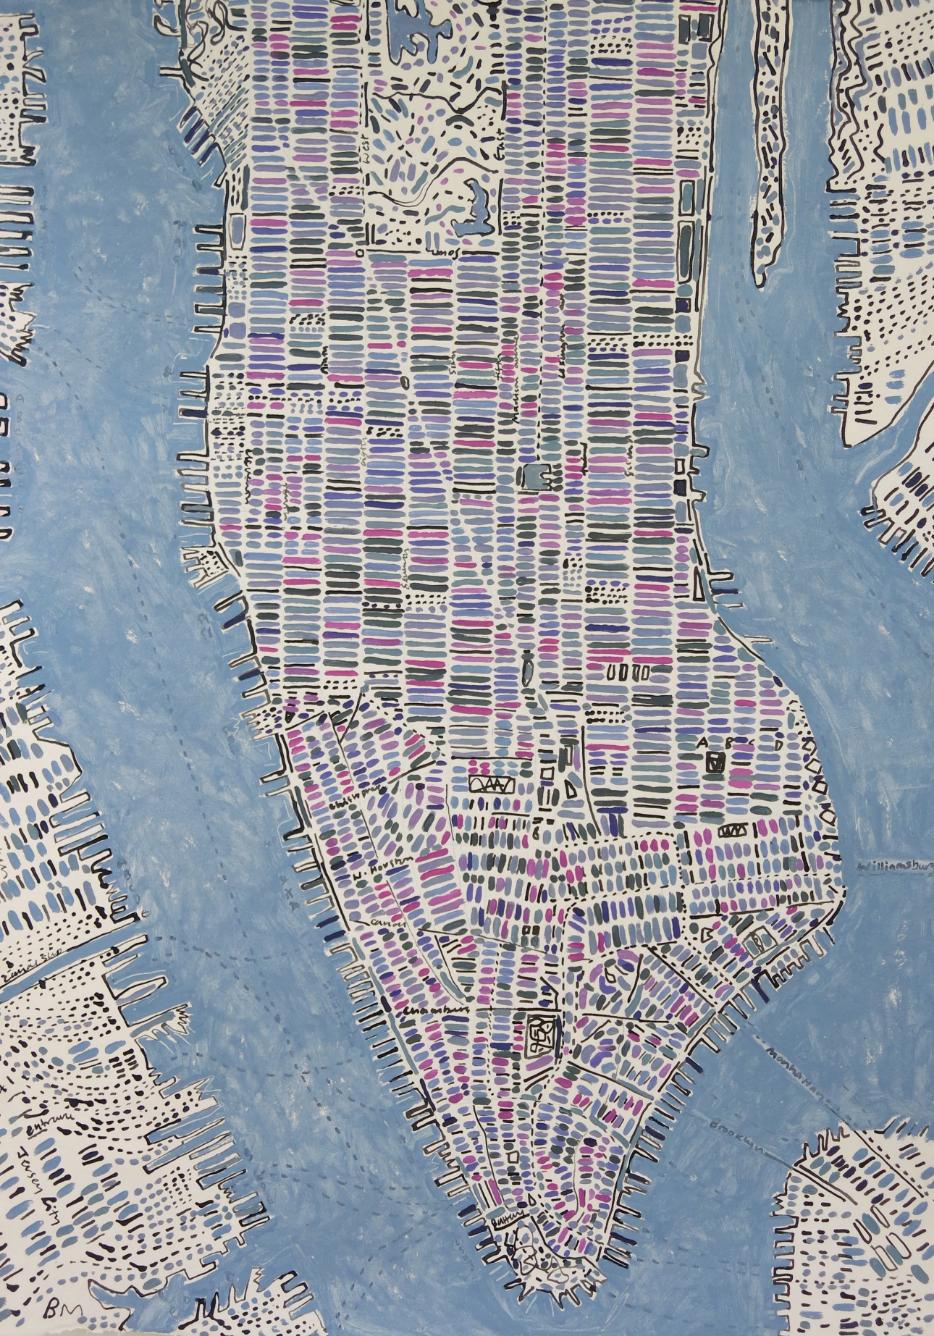 BARBARA MACFARLANE | Pink, Magenta, and Violet Manhattan | 2018